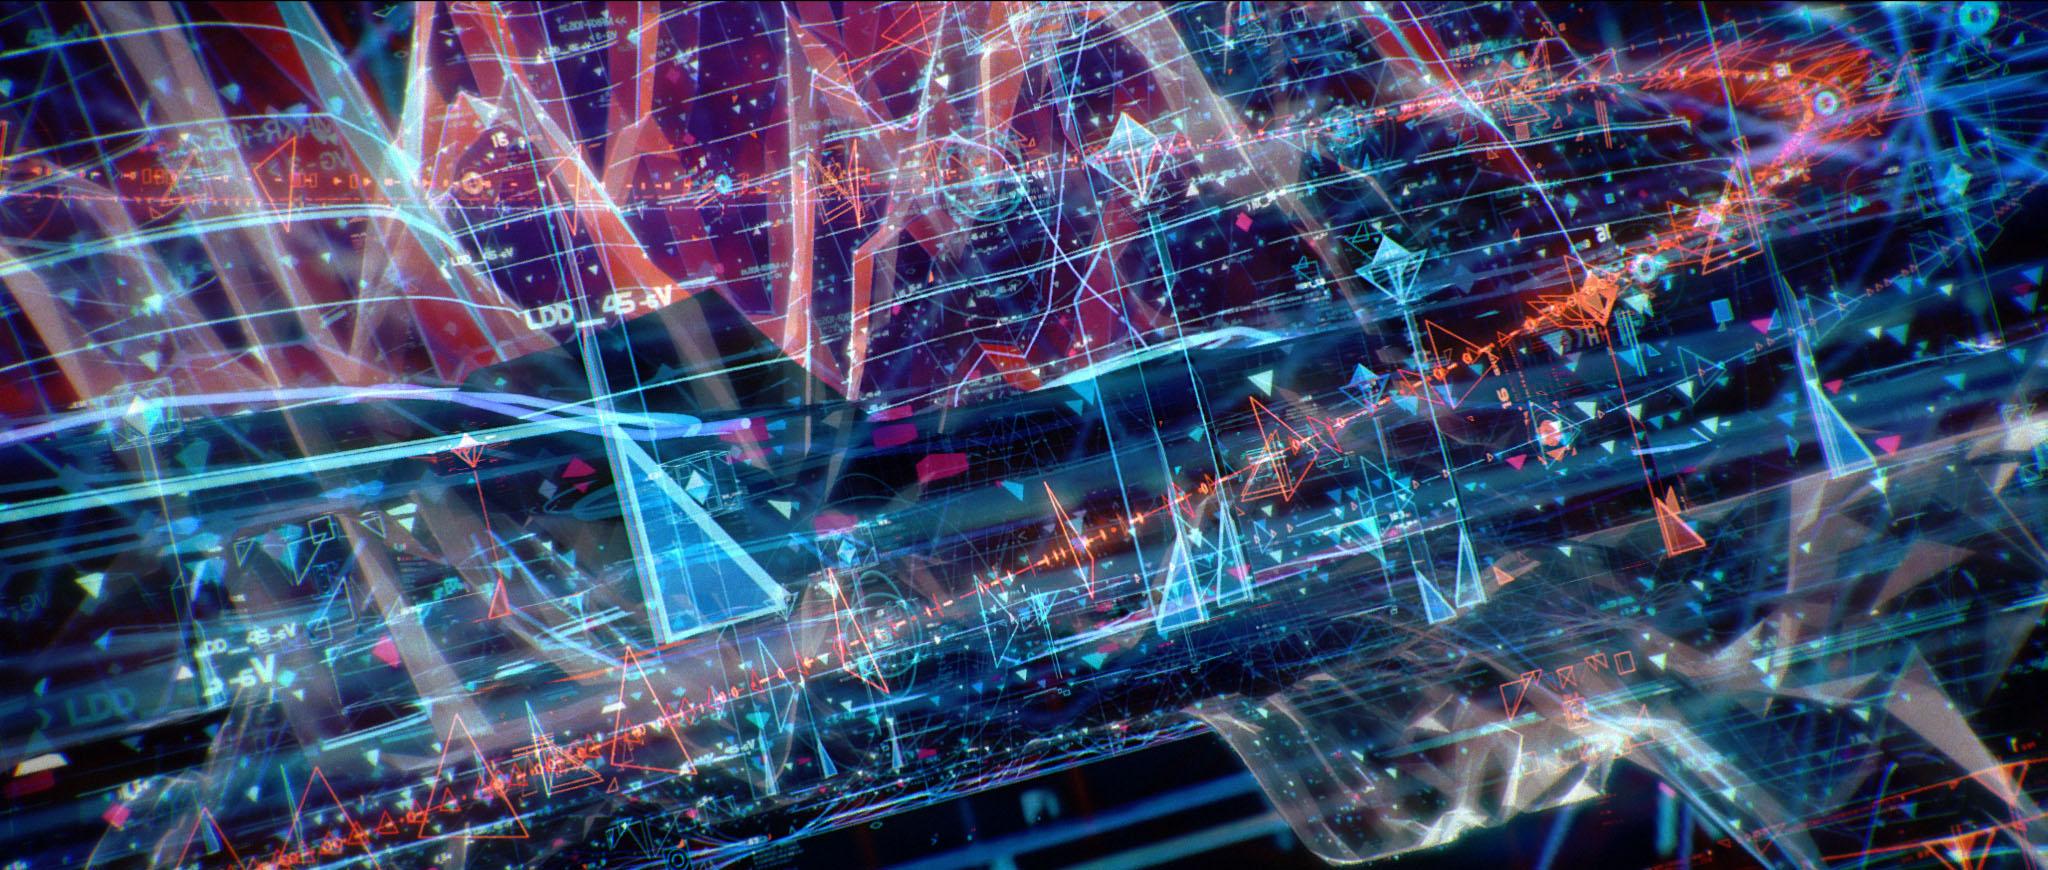 RLST_LaunchSchemA_Mesa_Cam06_v01b_2K (00047)_web_235.jpg